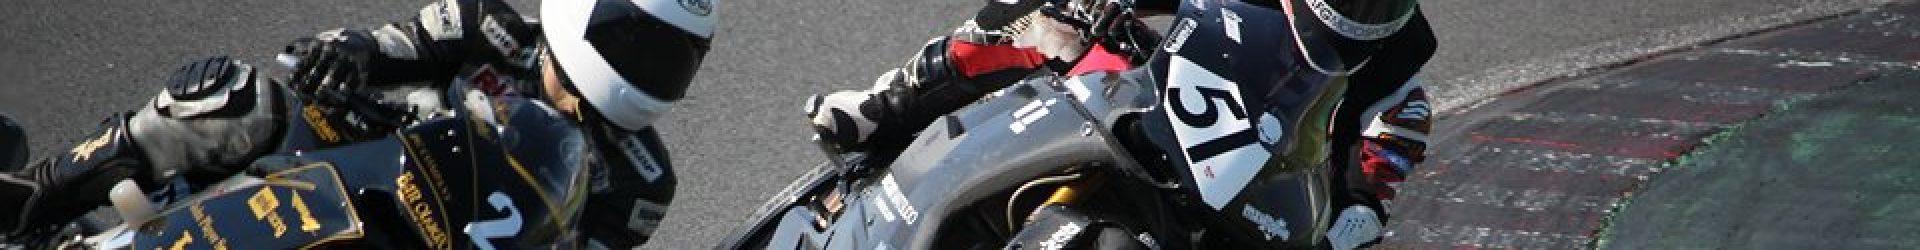 【MAX10第3戦】20170820 レース風景